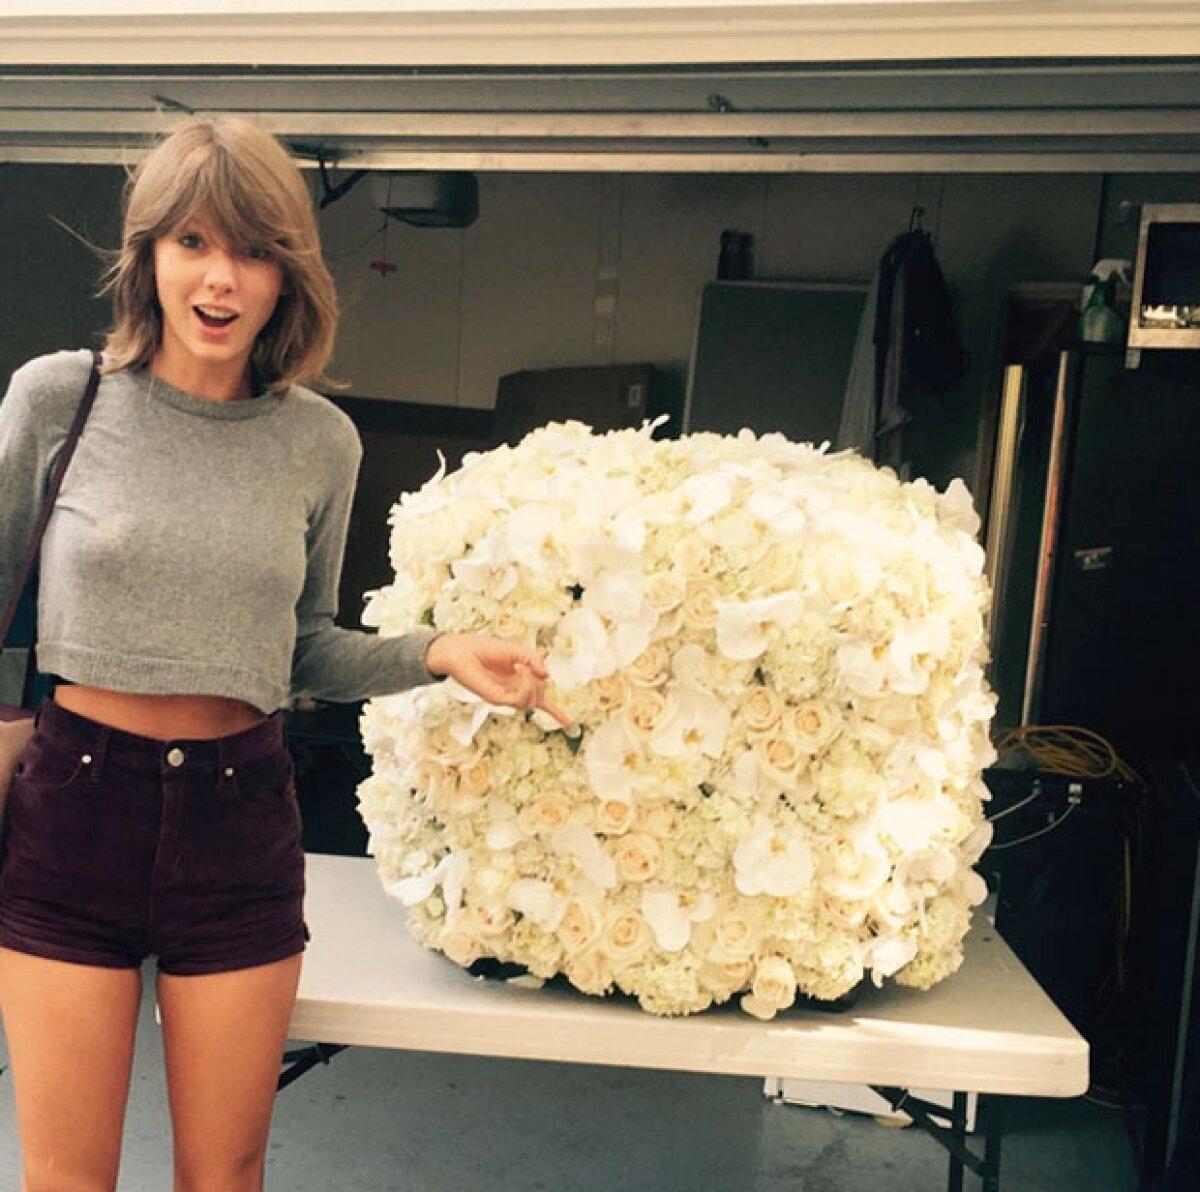 #KanTay: Kanye West sorprende a Taylor Swift con especial regalo